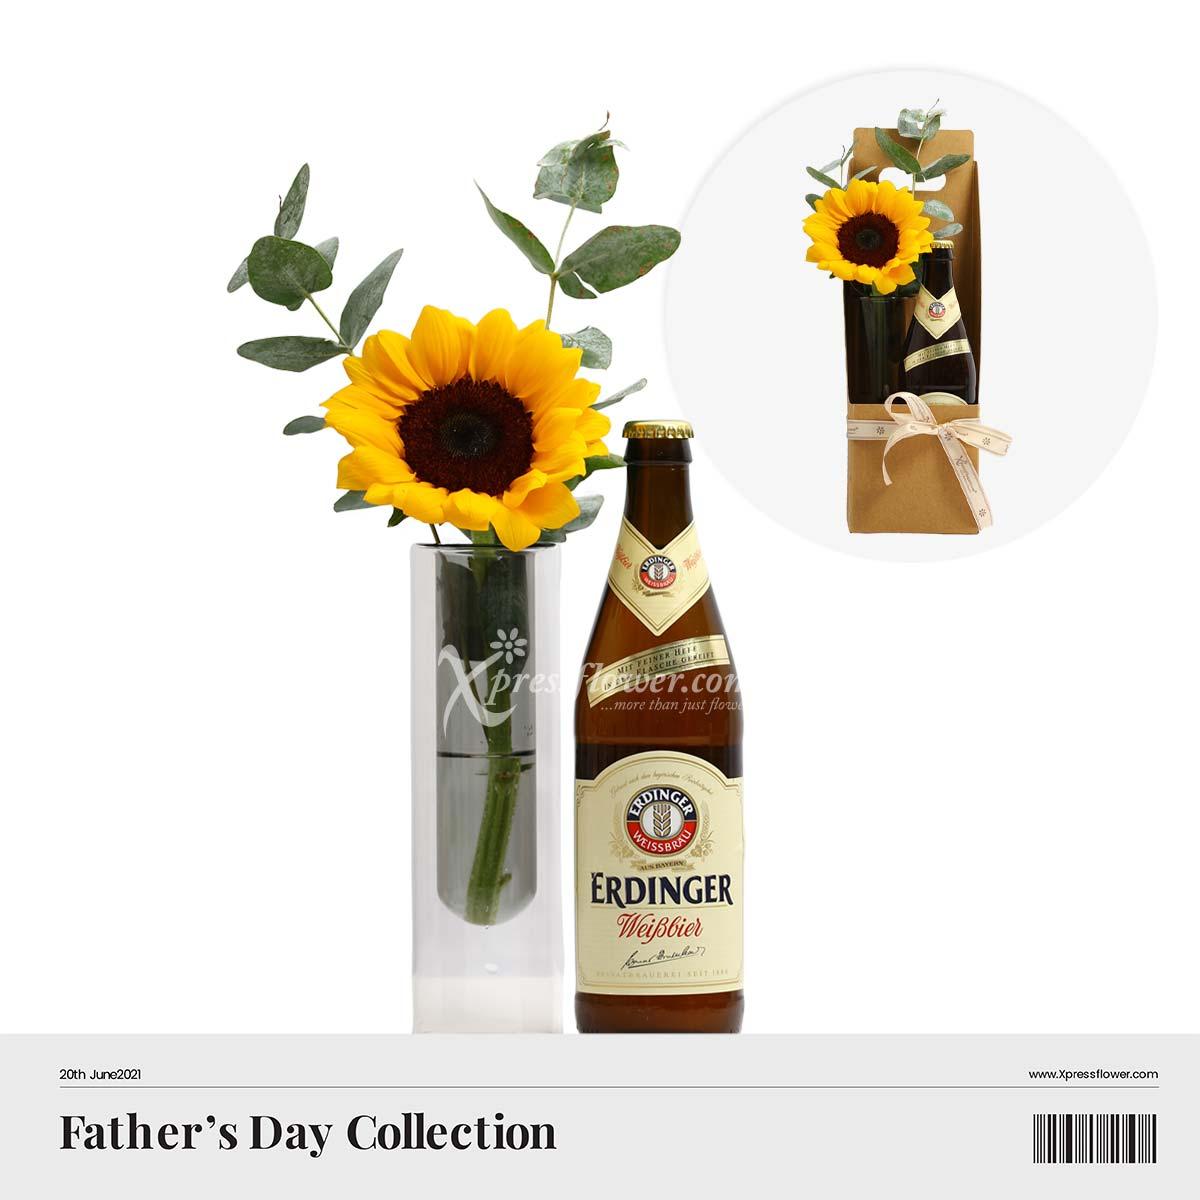 A Toast to Sunny Days (1 sunflower with Erdinger Weissbier beer)